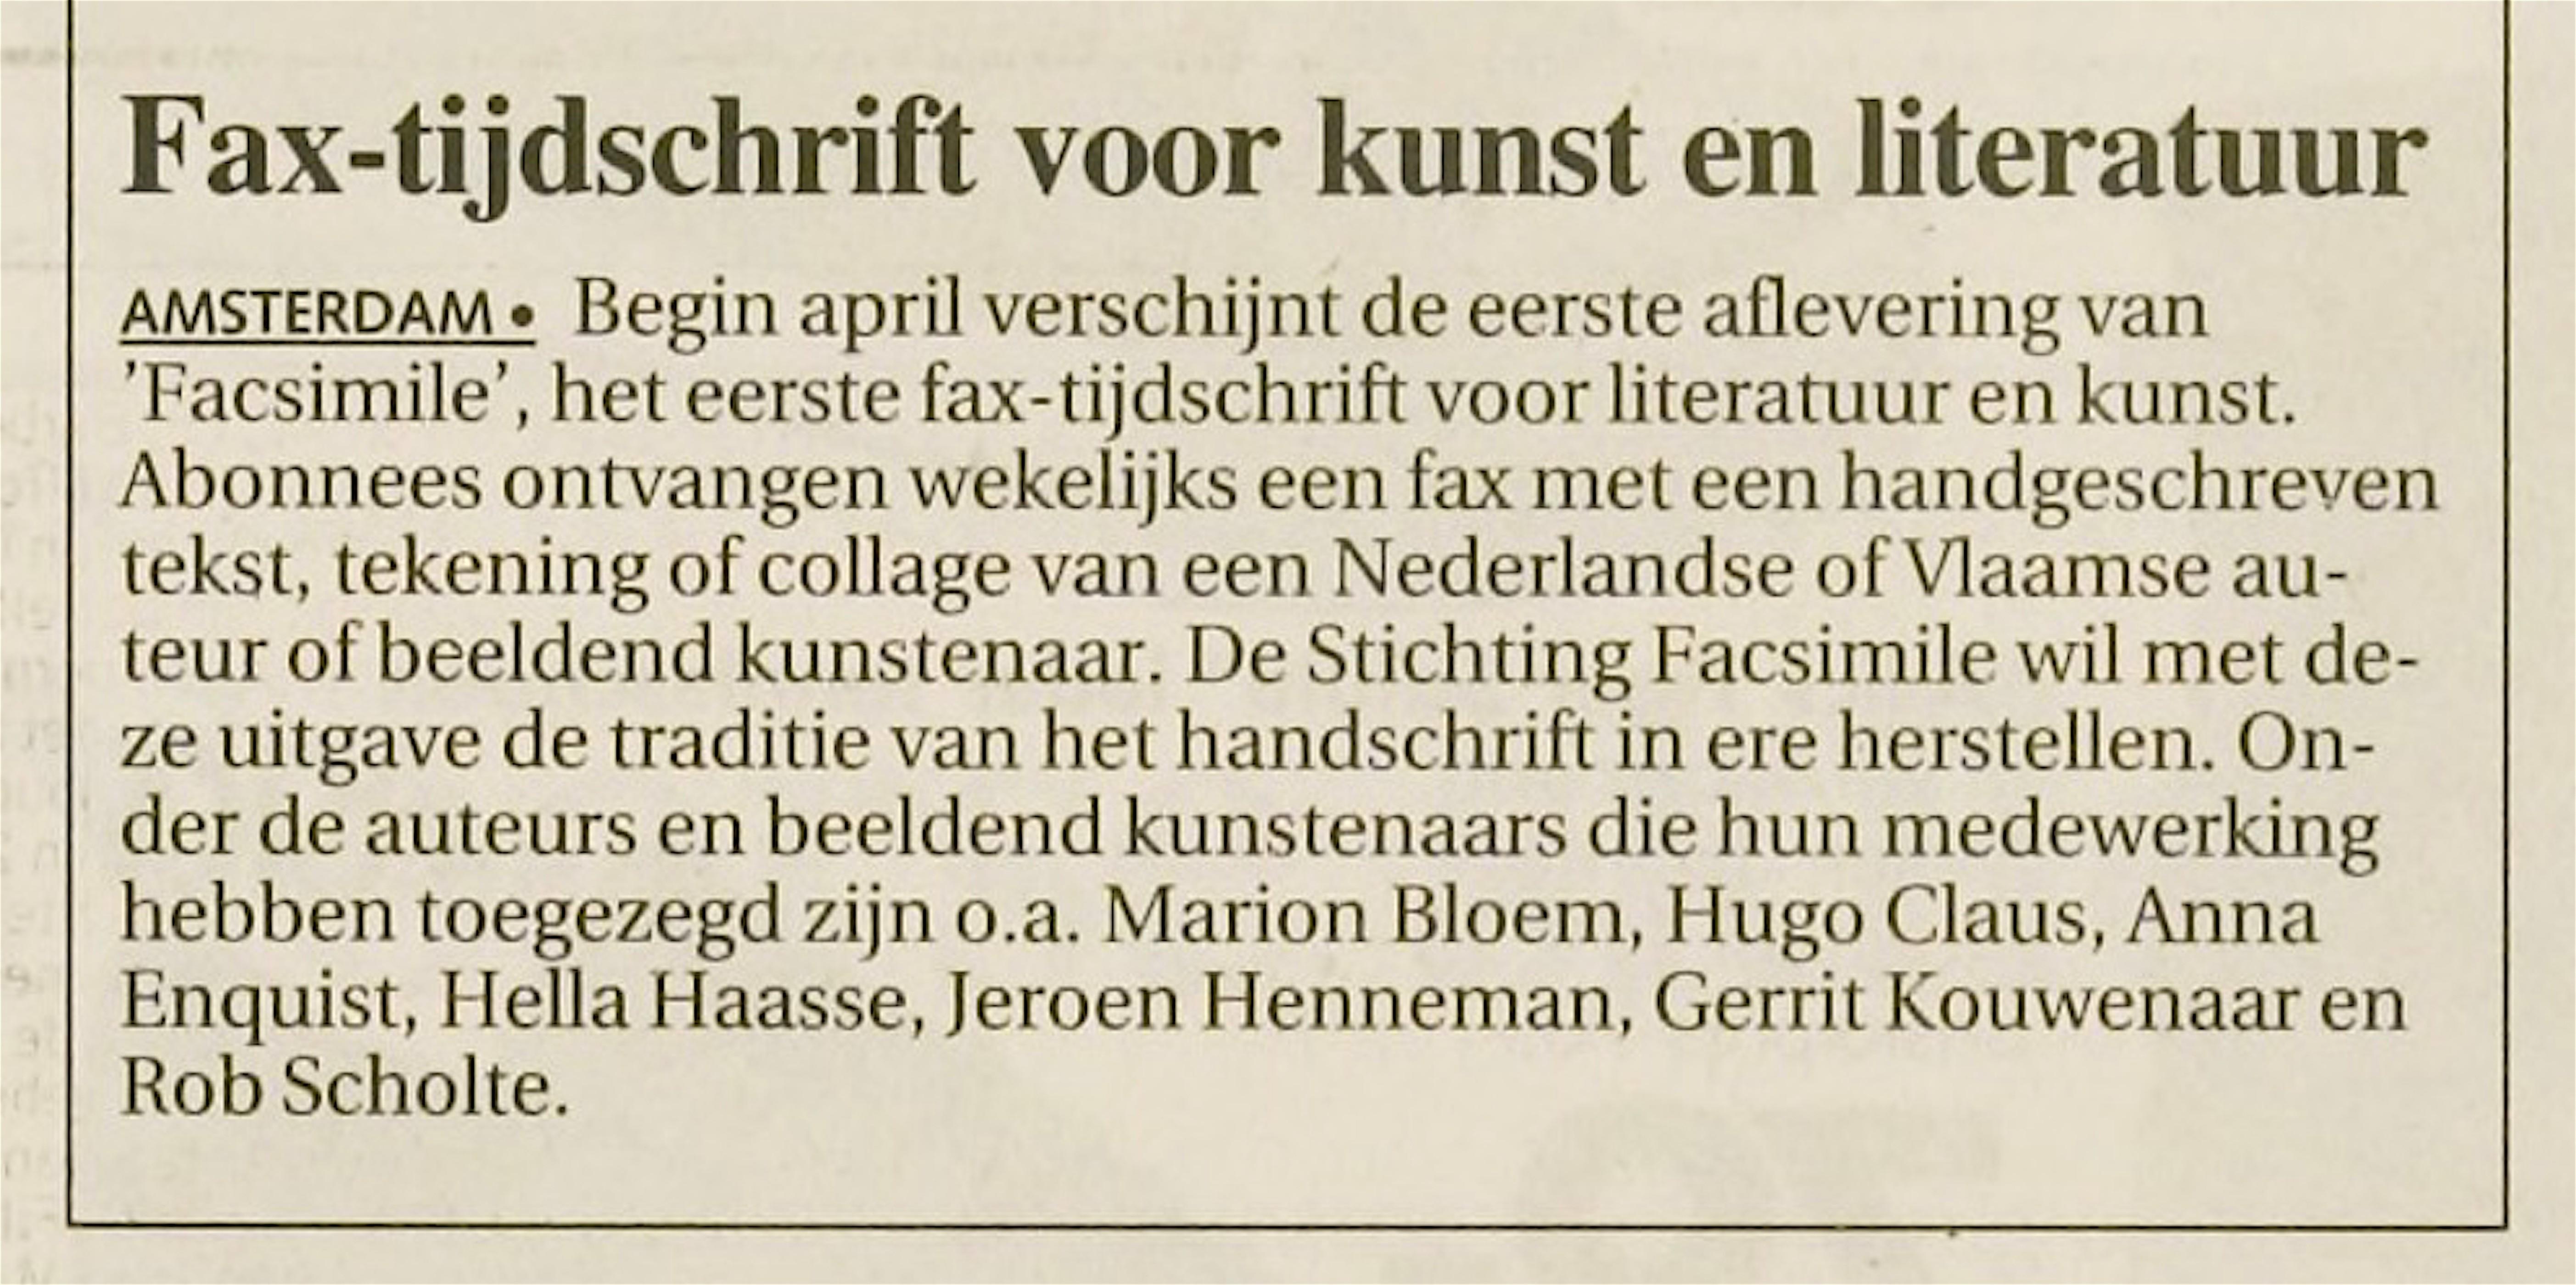 Leidsch Dagblad   9 februari 1994   pagina 21 (21/26)